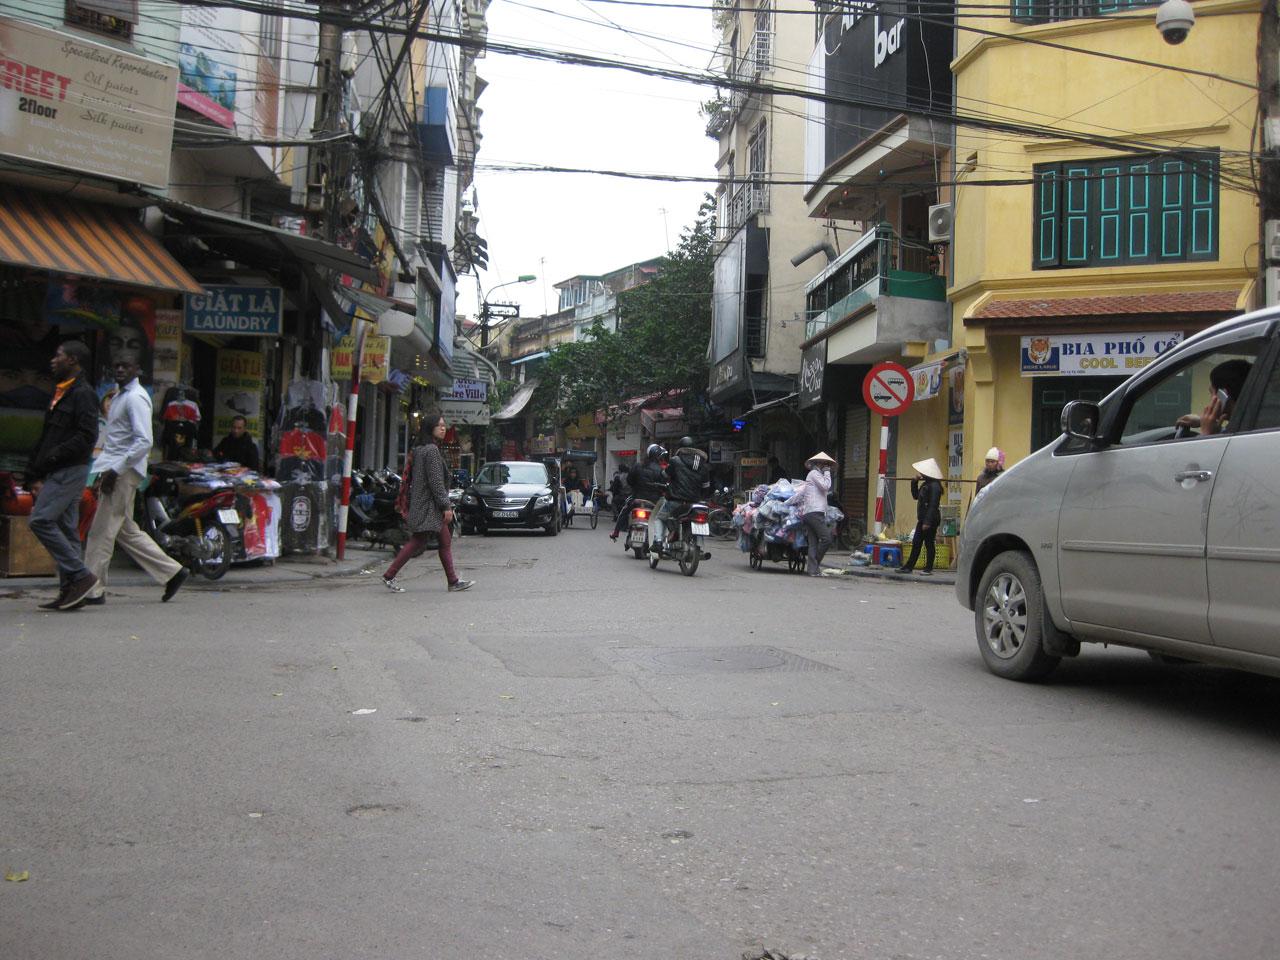 Bia hoi corner in Hanoi's Old Quarter, Vietnam